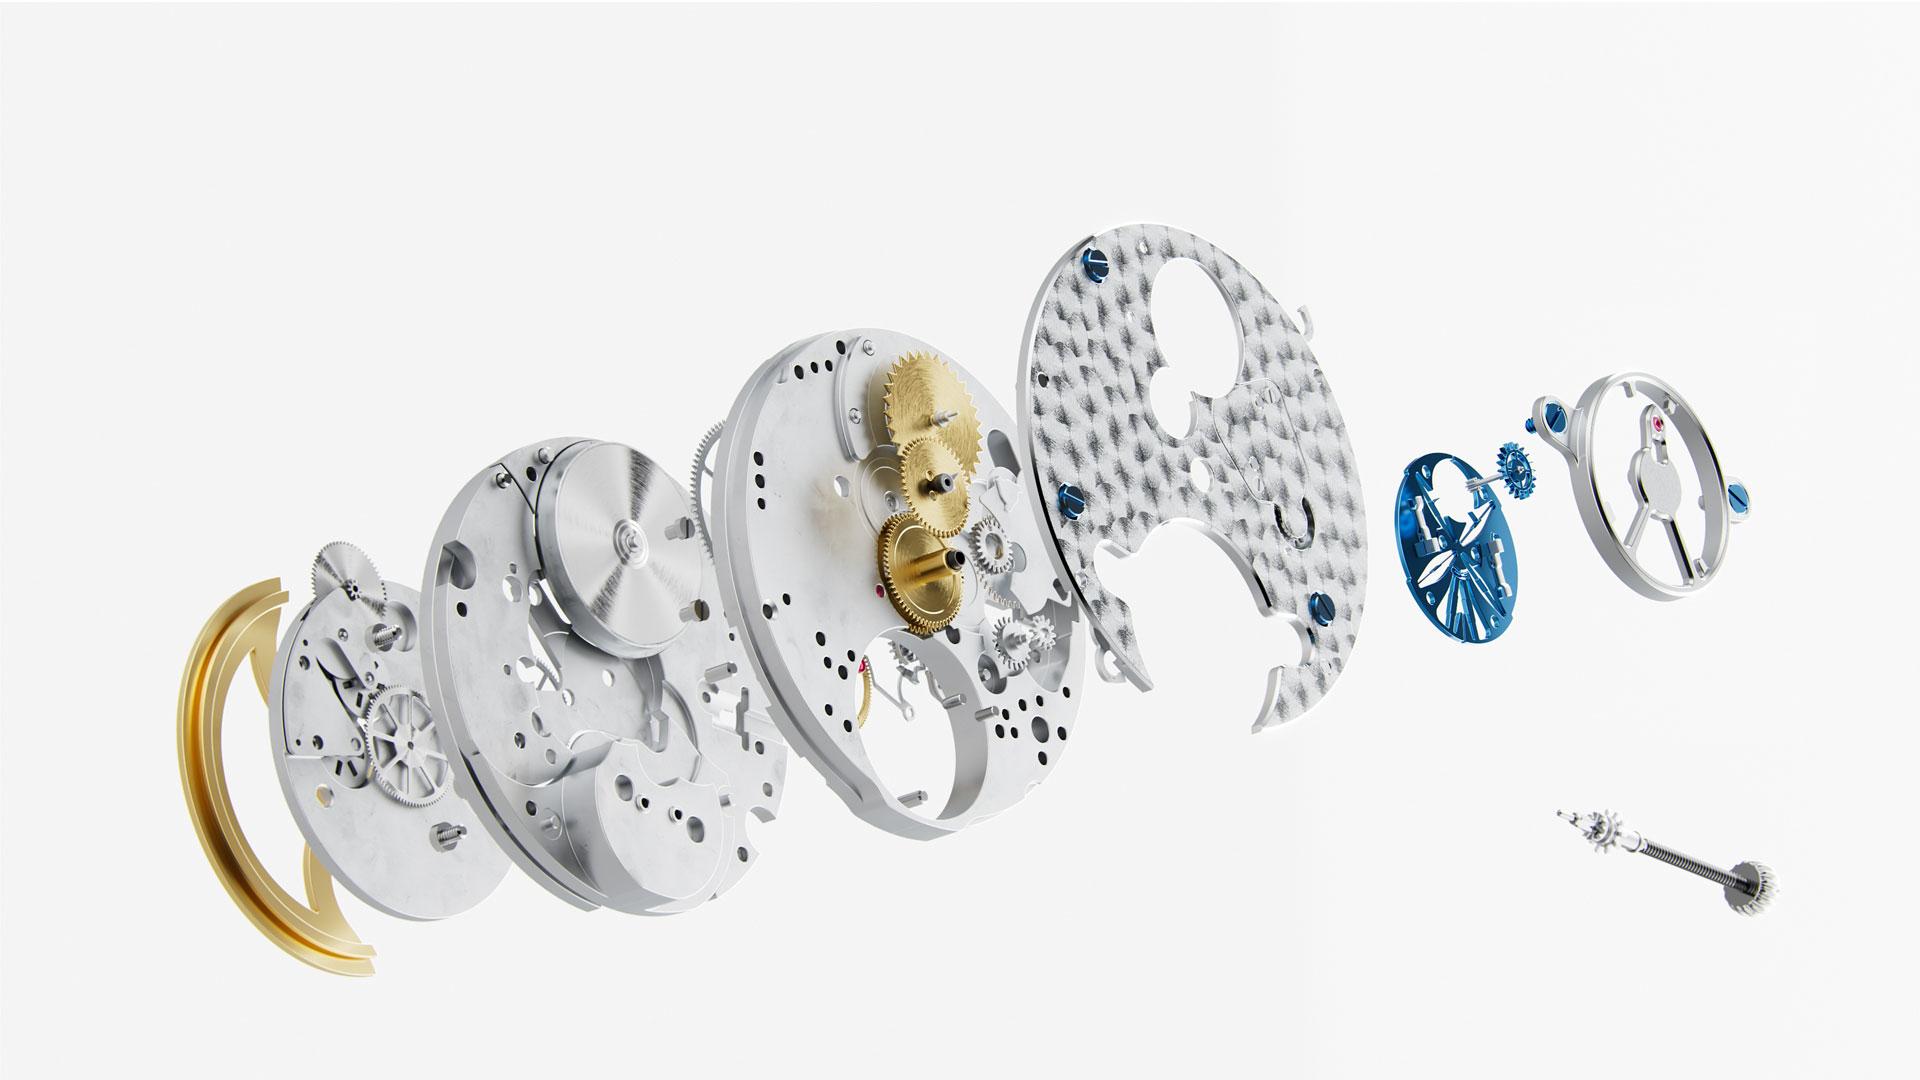 Frederique-Constant Slimline Monolithic Manufacture